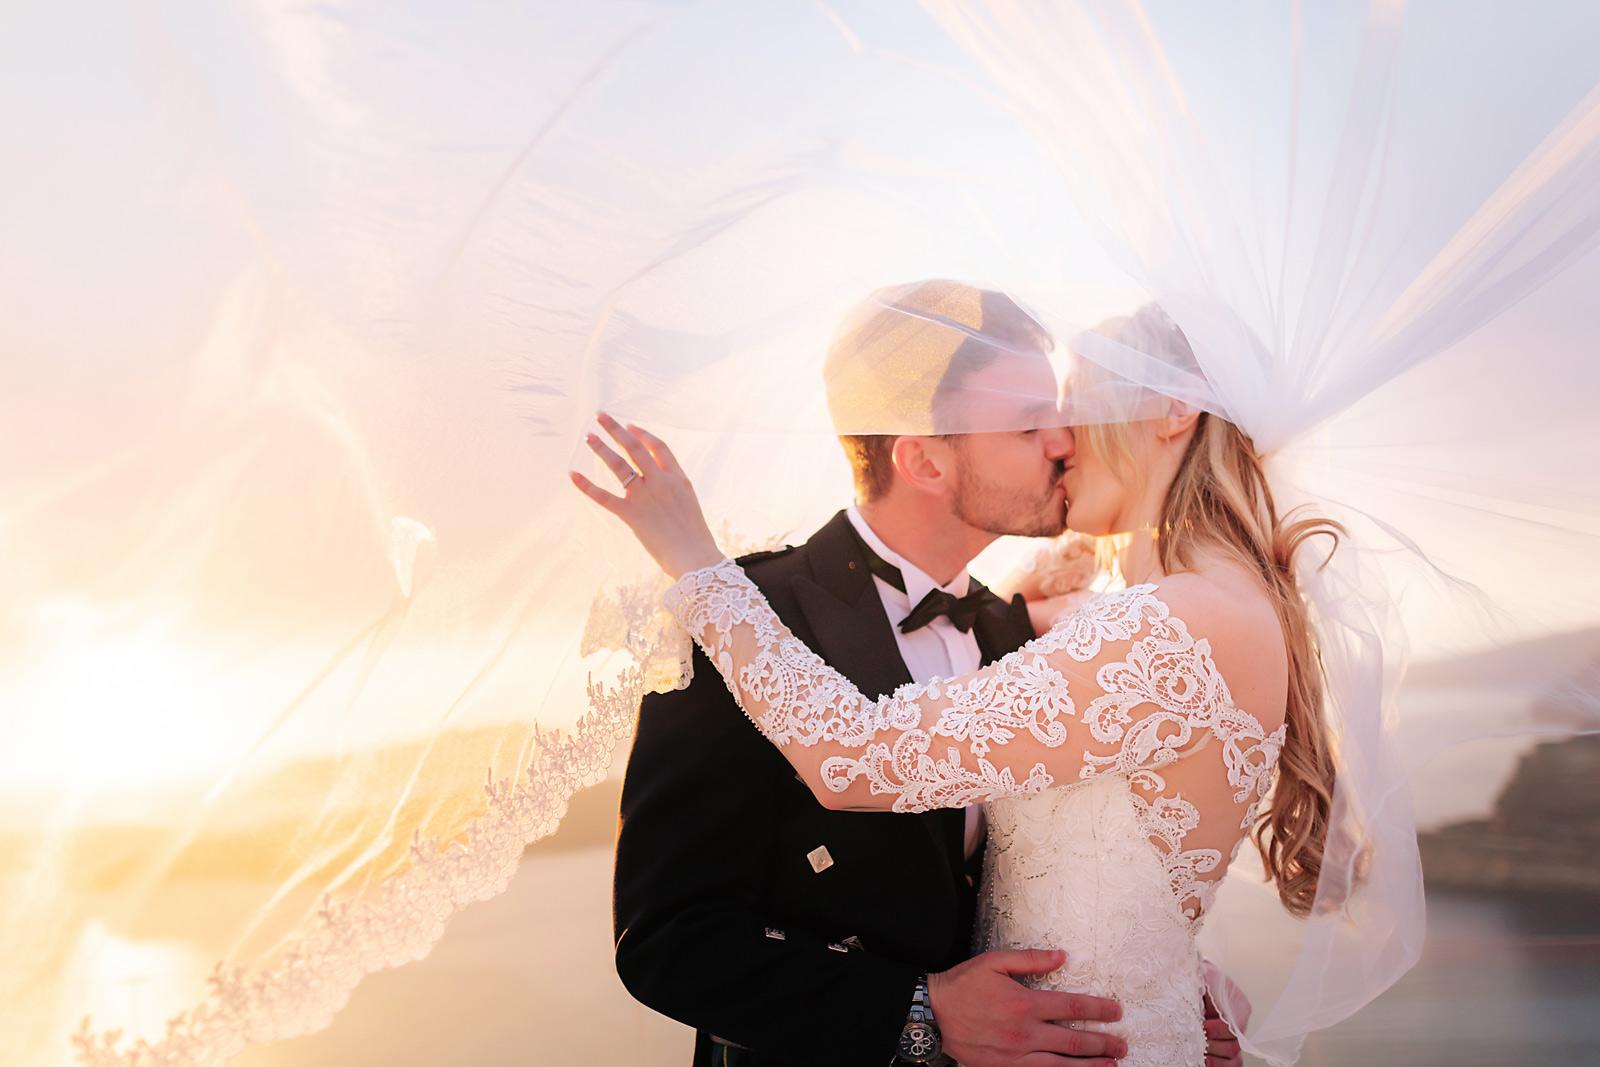 Wedding photographer in Greece: Irina Spiru